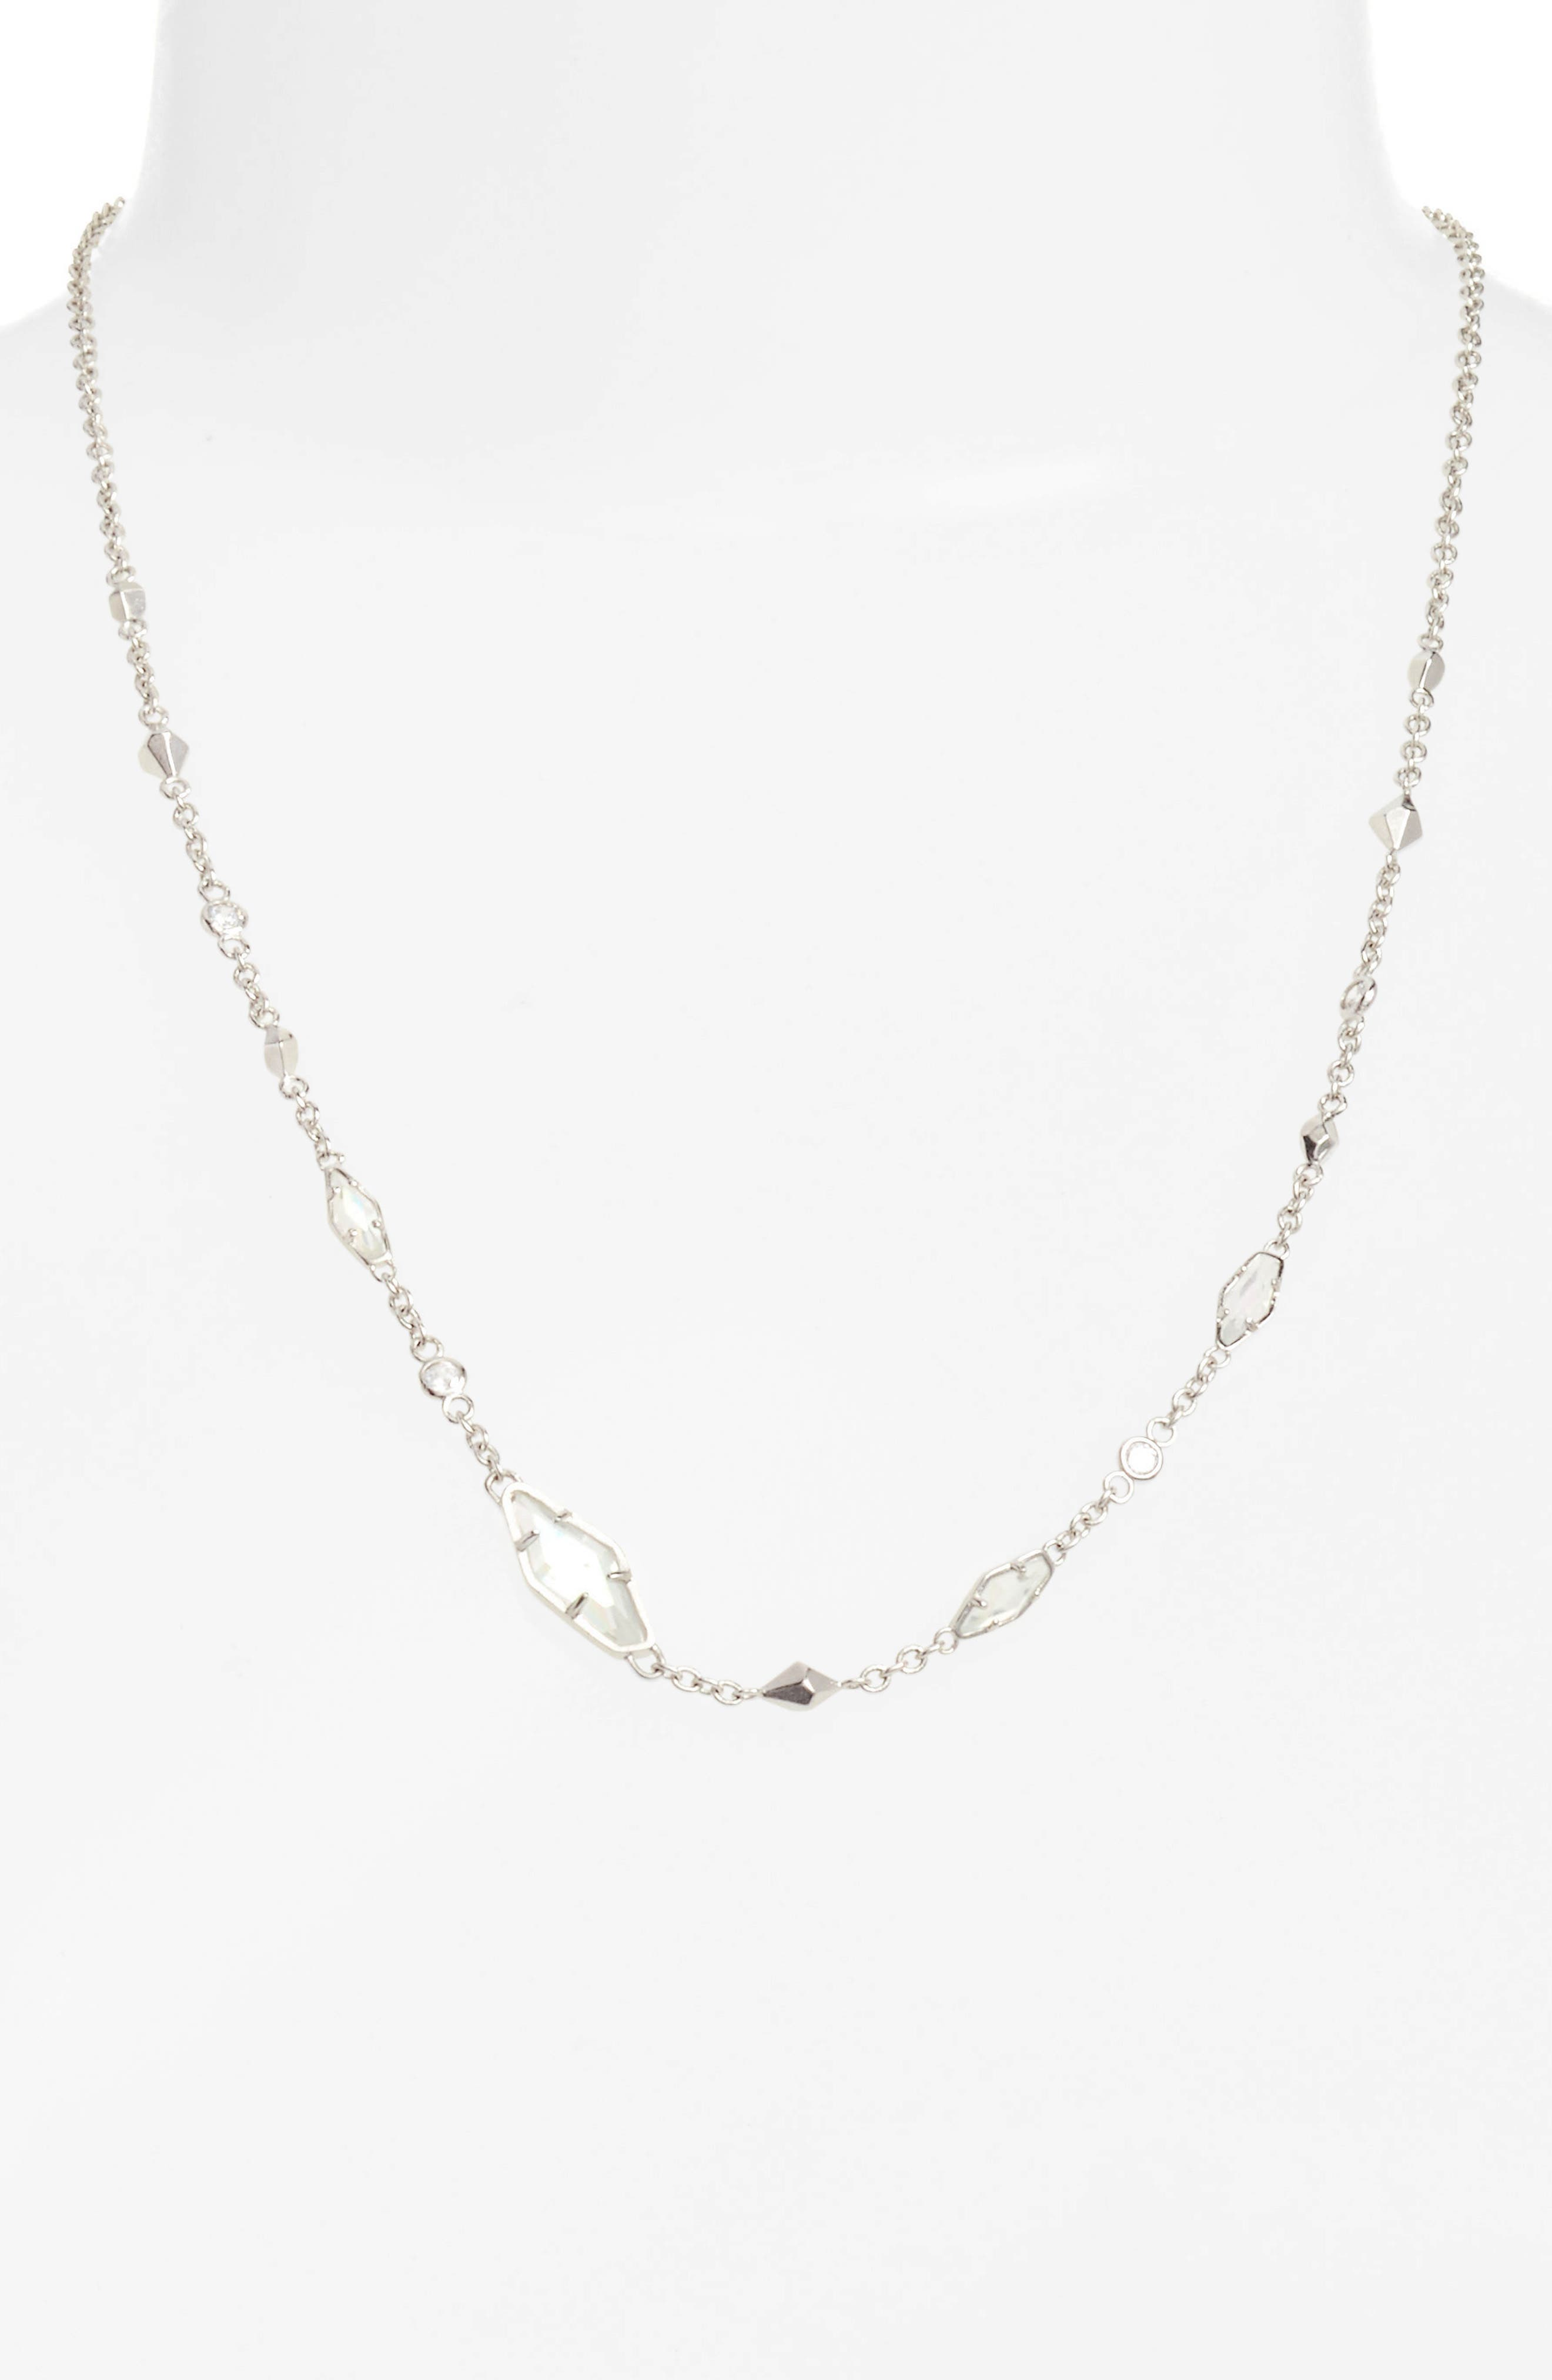 Main Image - Kendra Scott 'Debra' Jewel Necklace